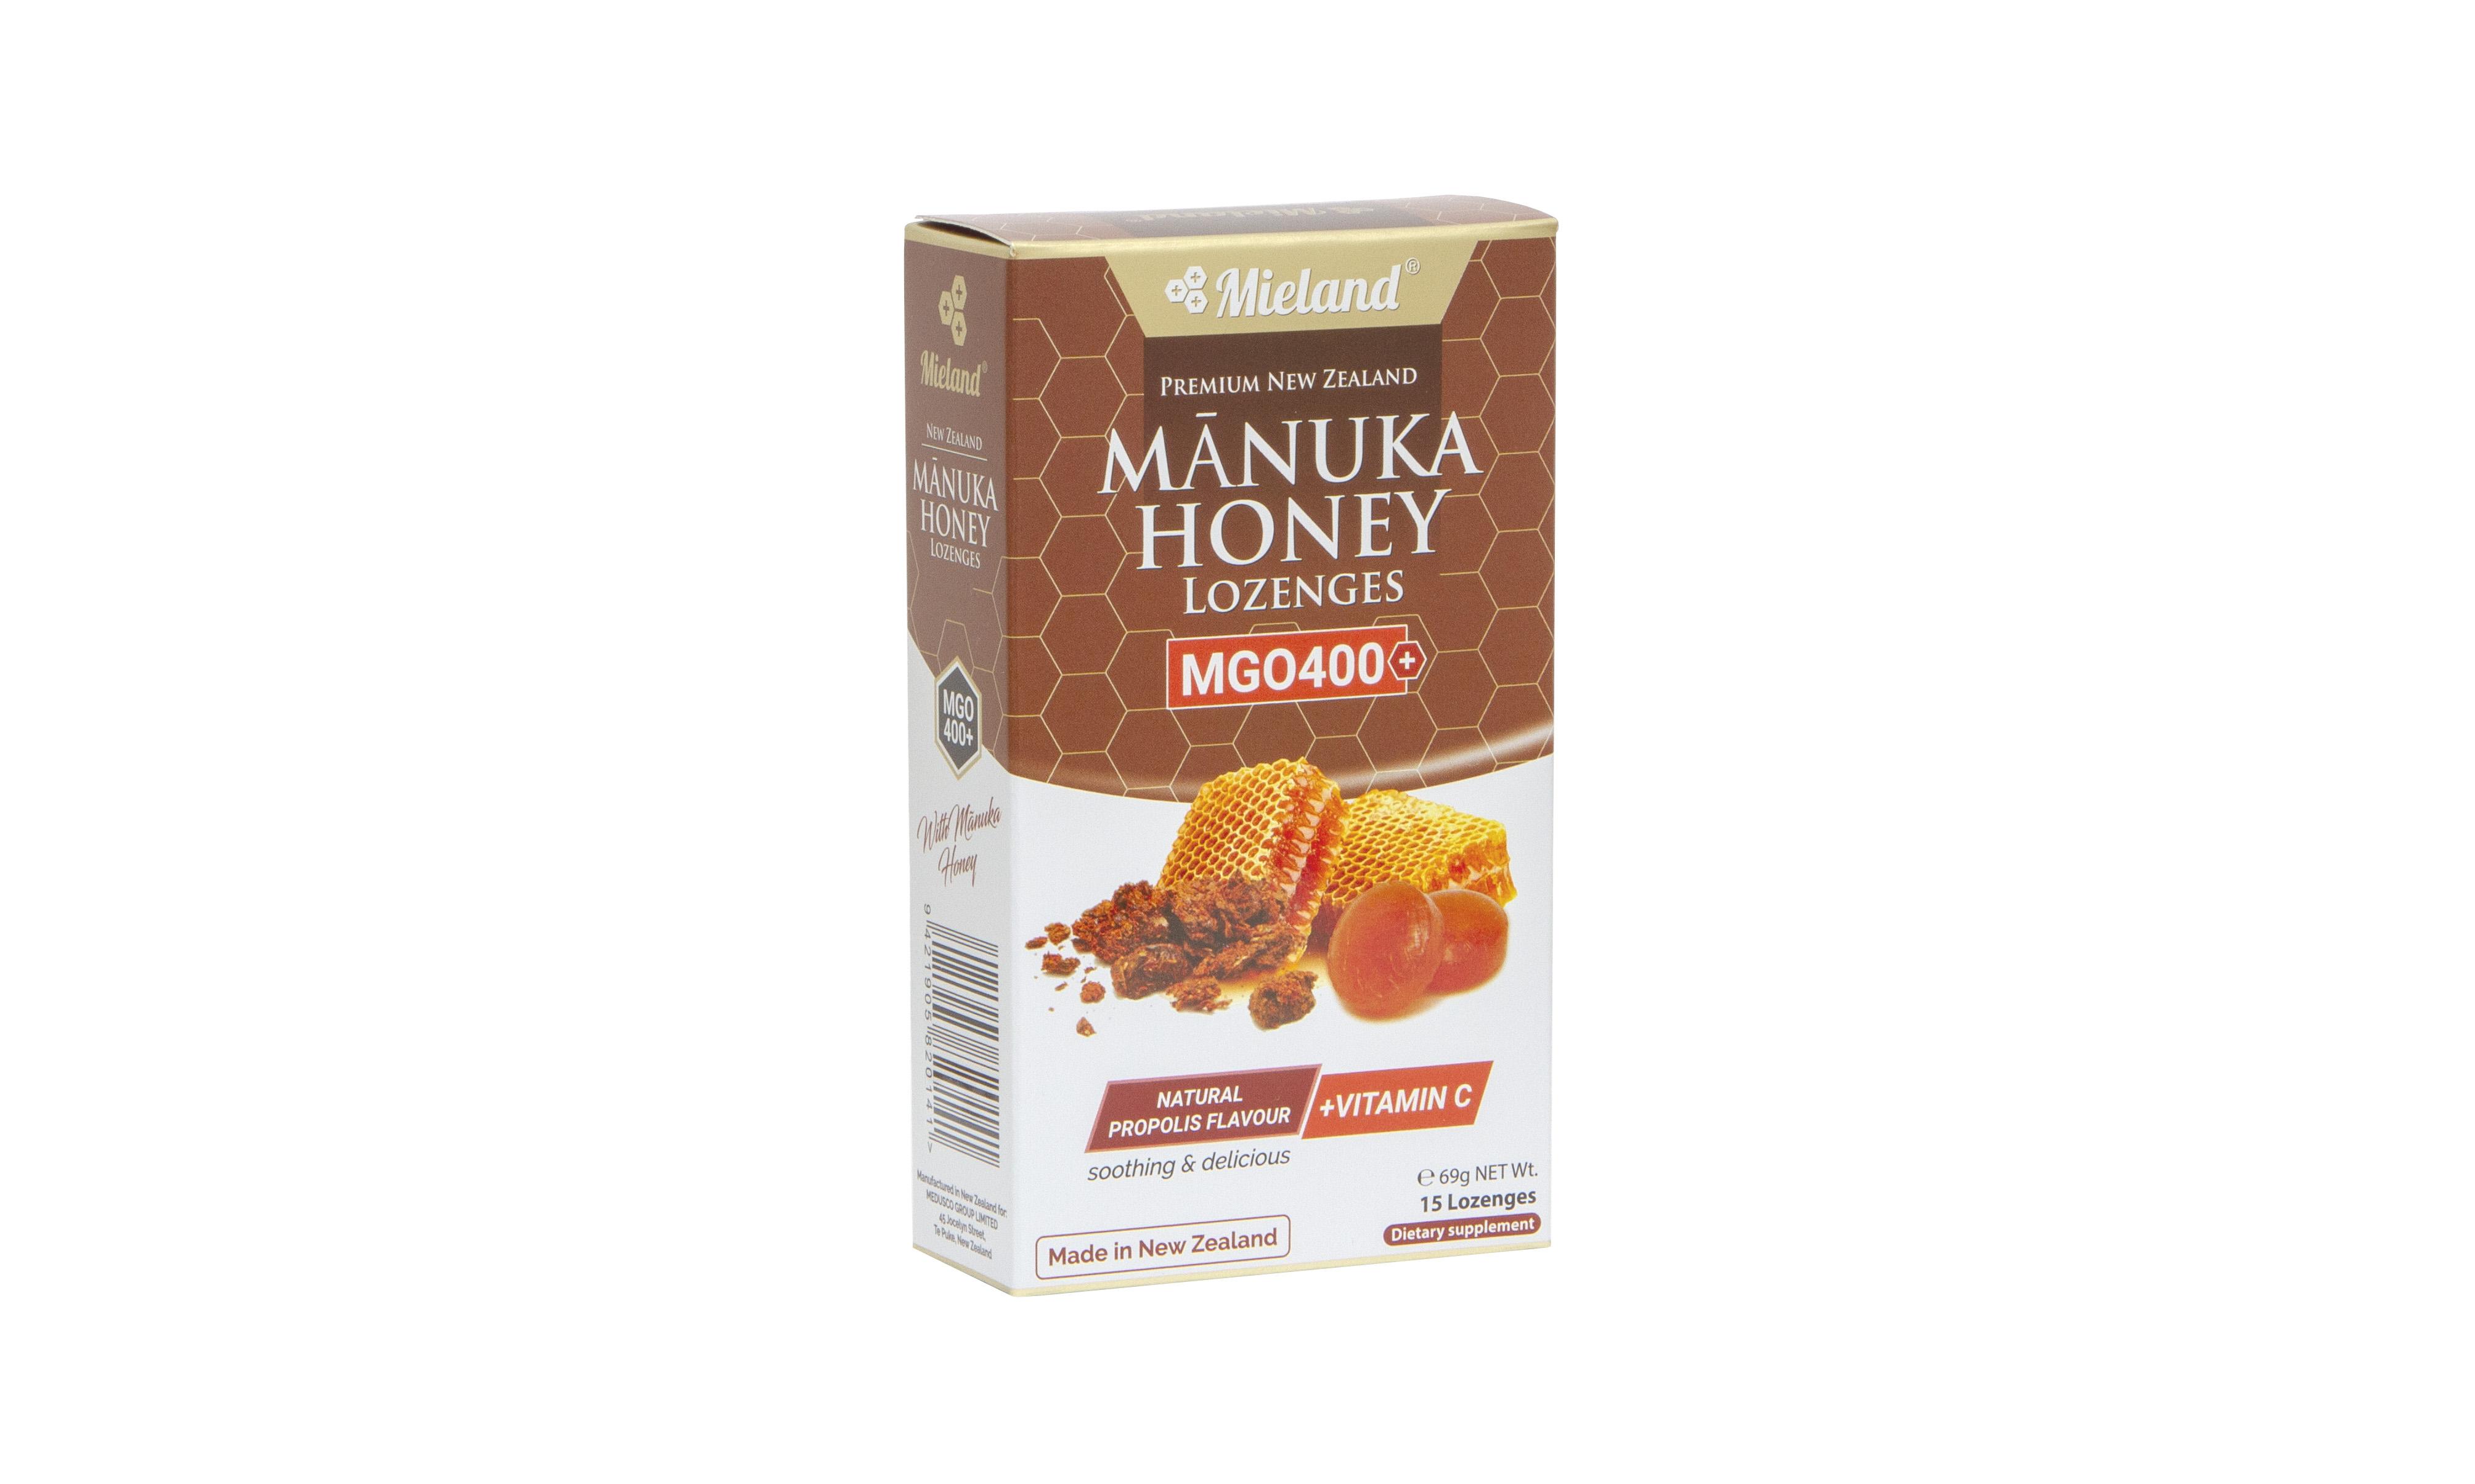 Manuka Honey Lozenges with Propolis flavour